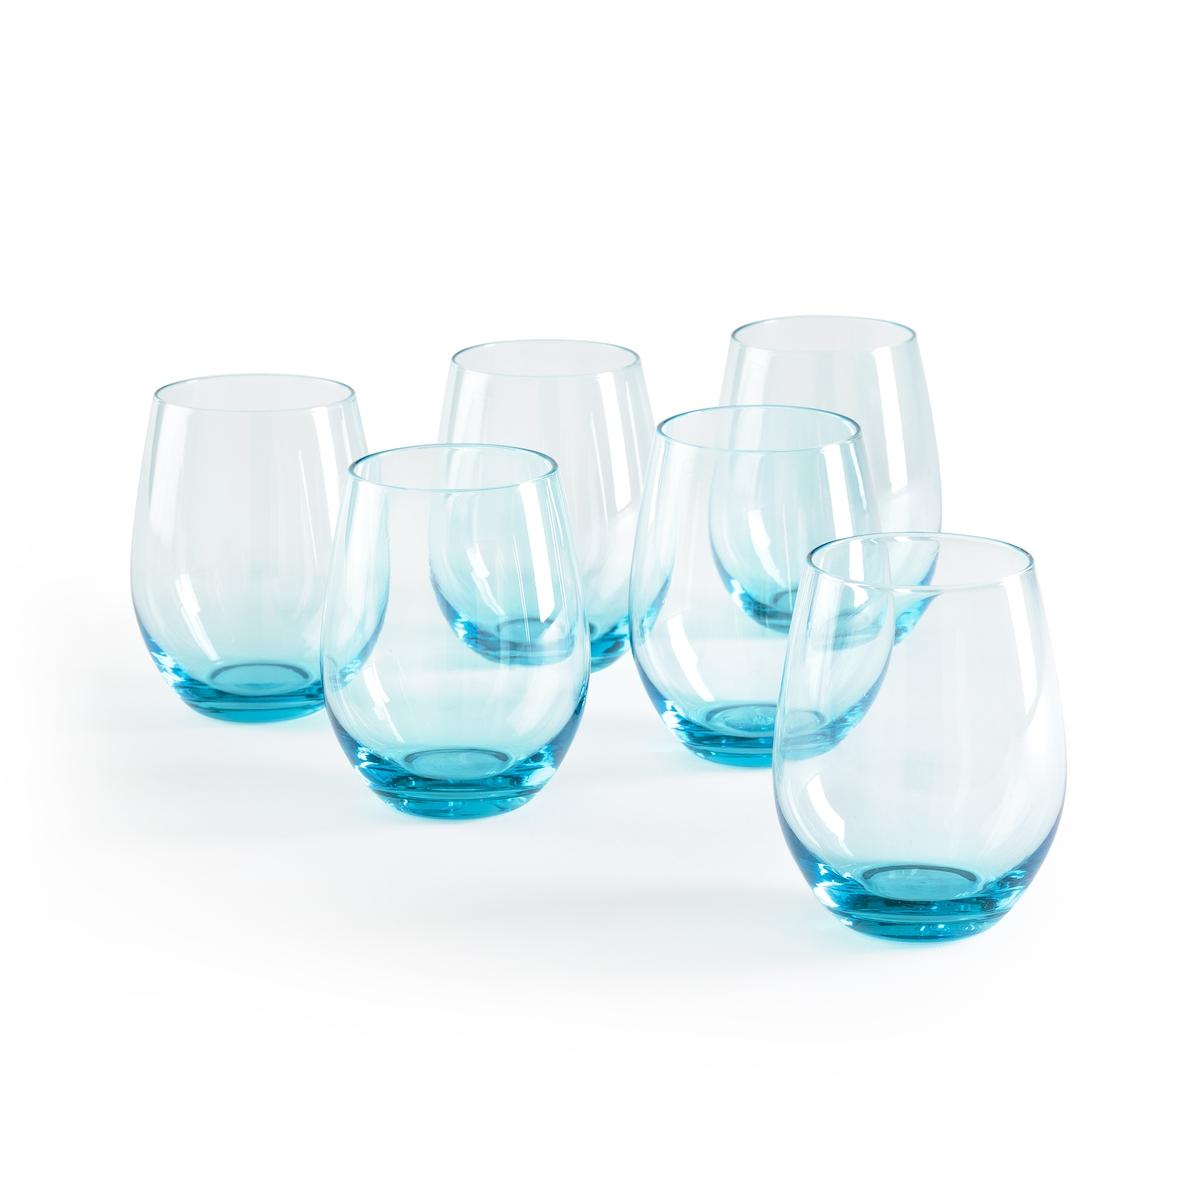 Комплект из 6 стаканов Nubia